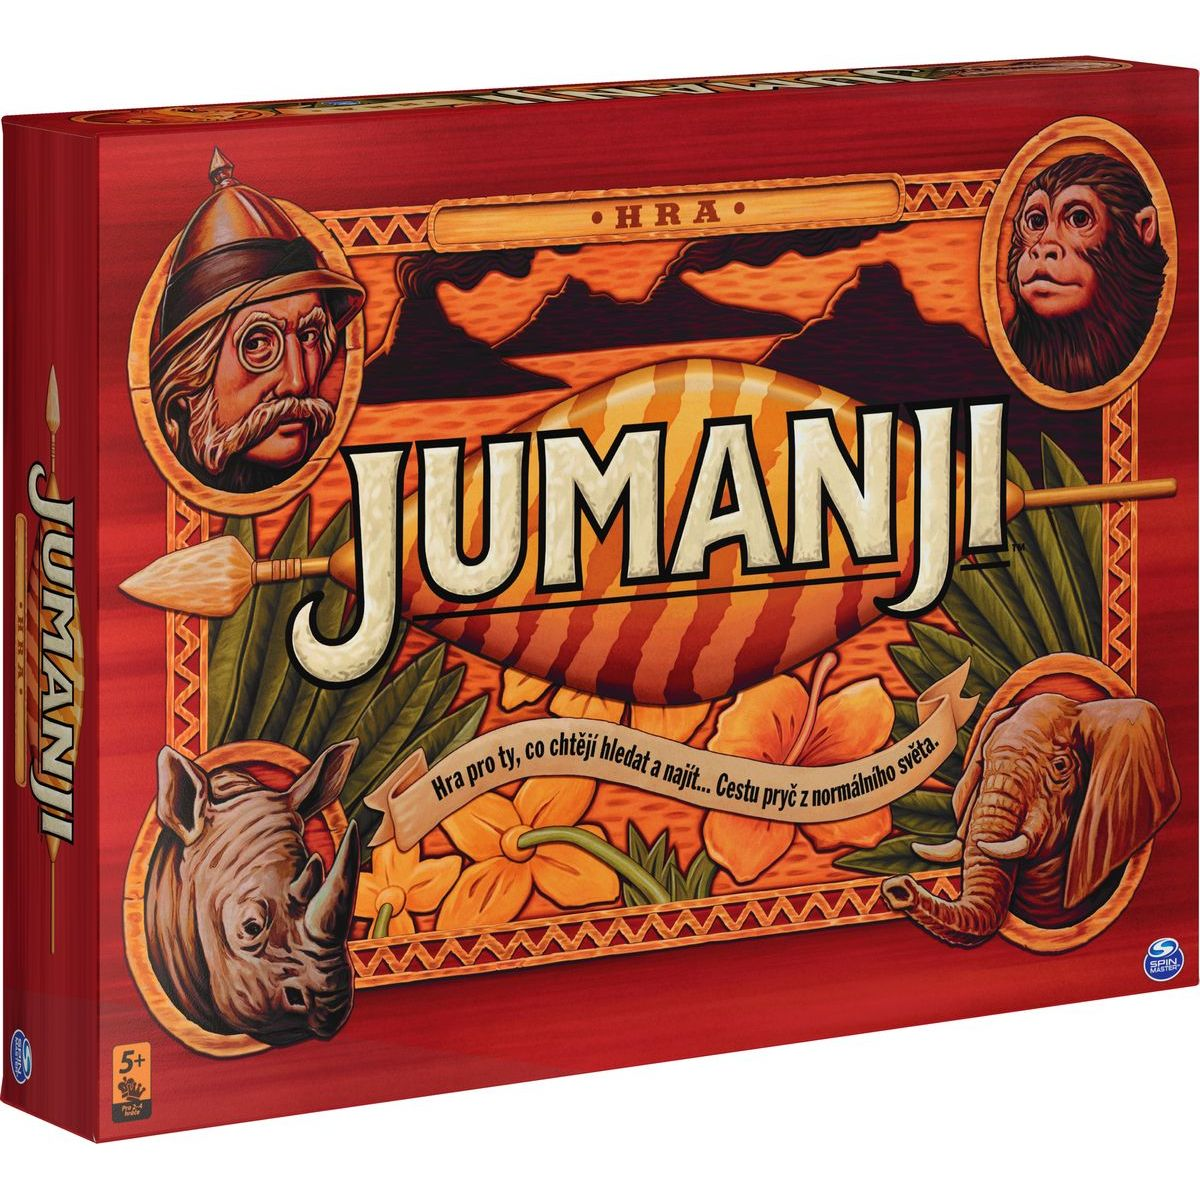 Jumanji spoločenská hra CZ